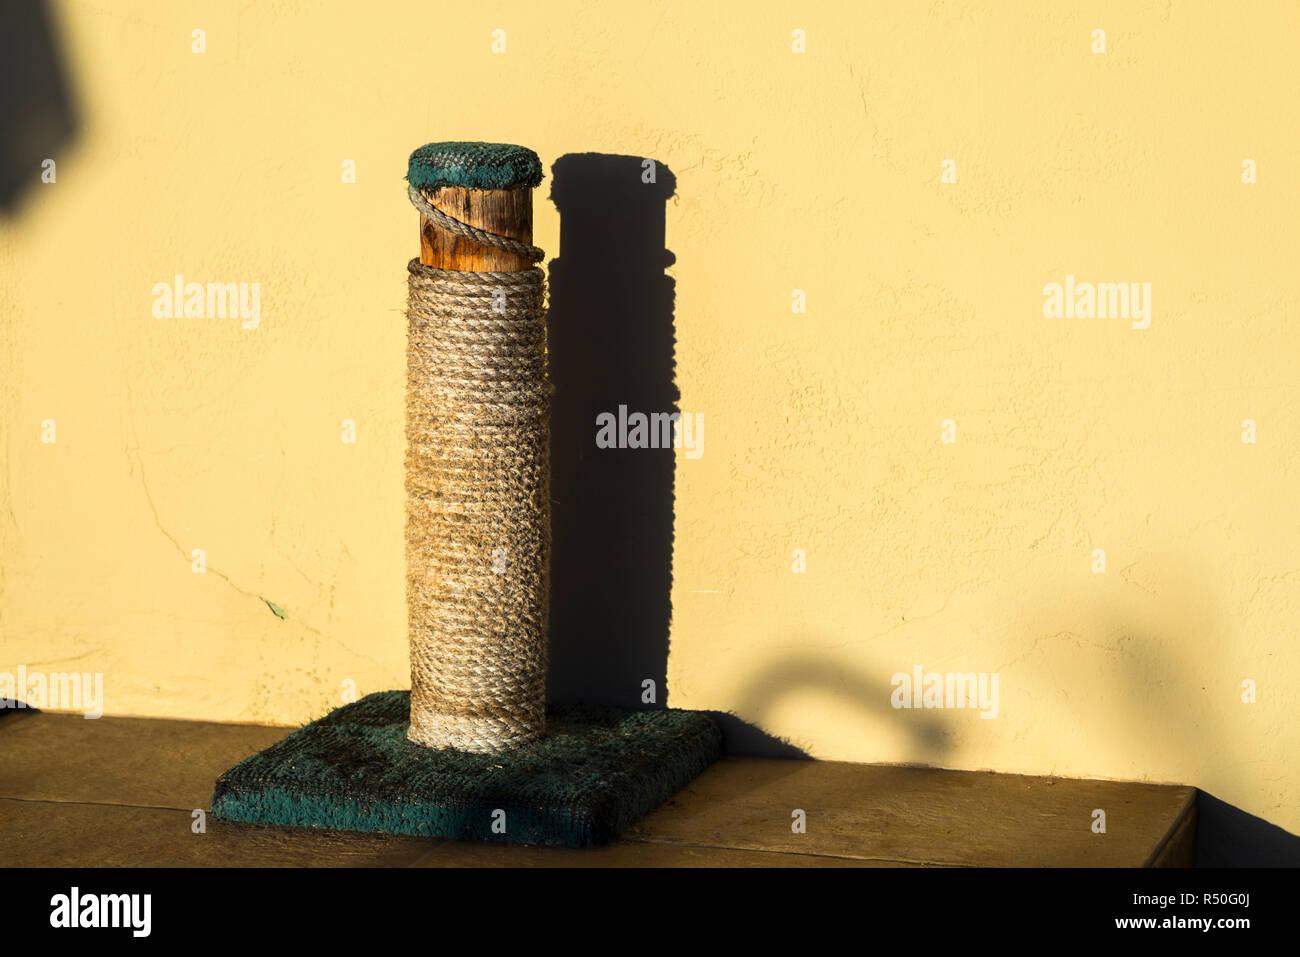 Scratch Stock Photos & Scratch Stock Images - Alamy